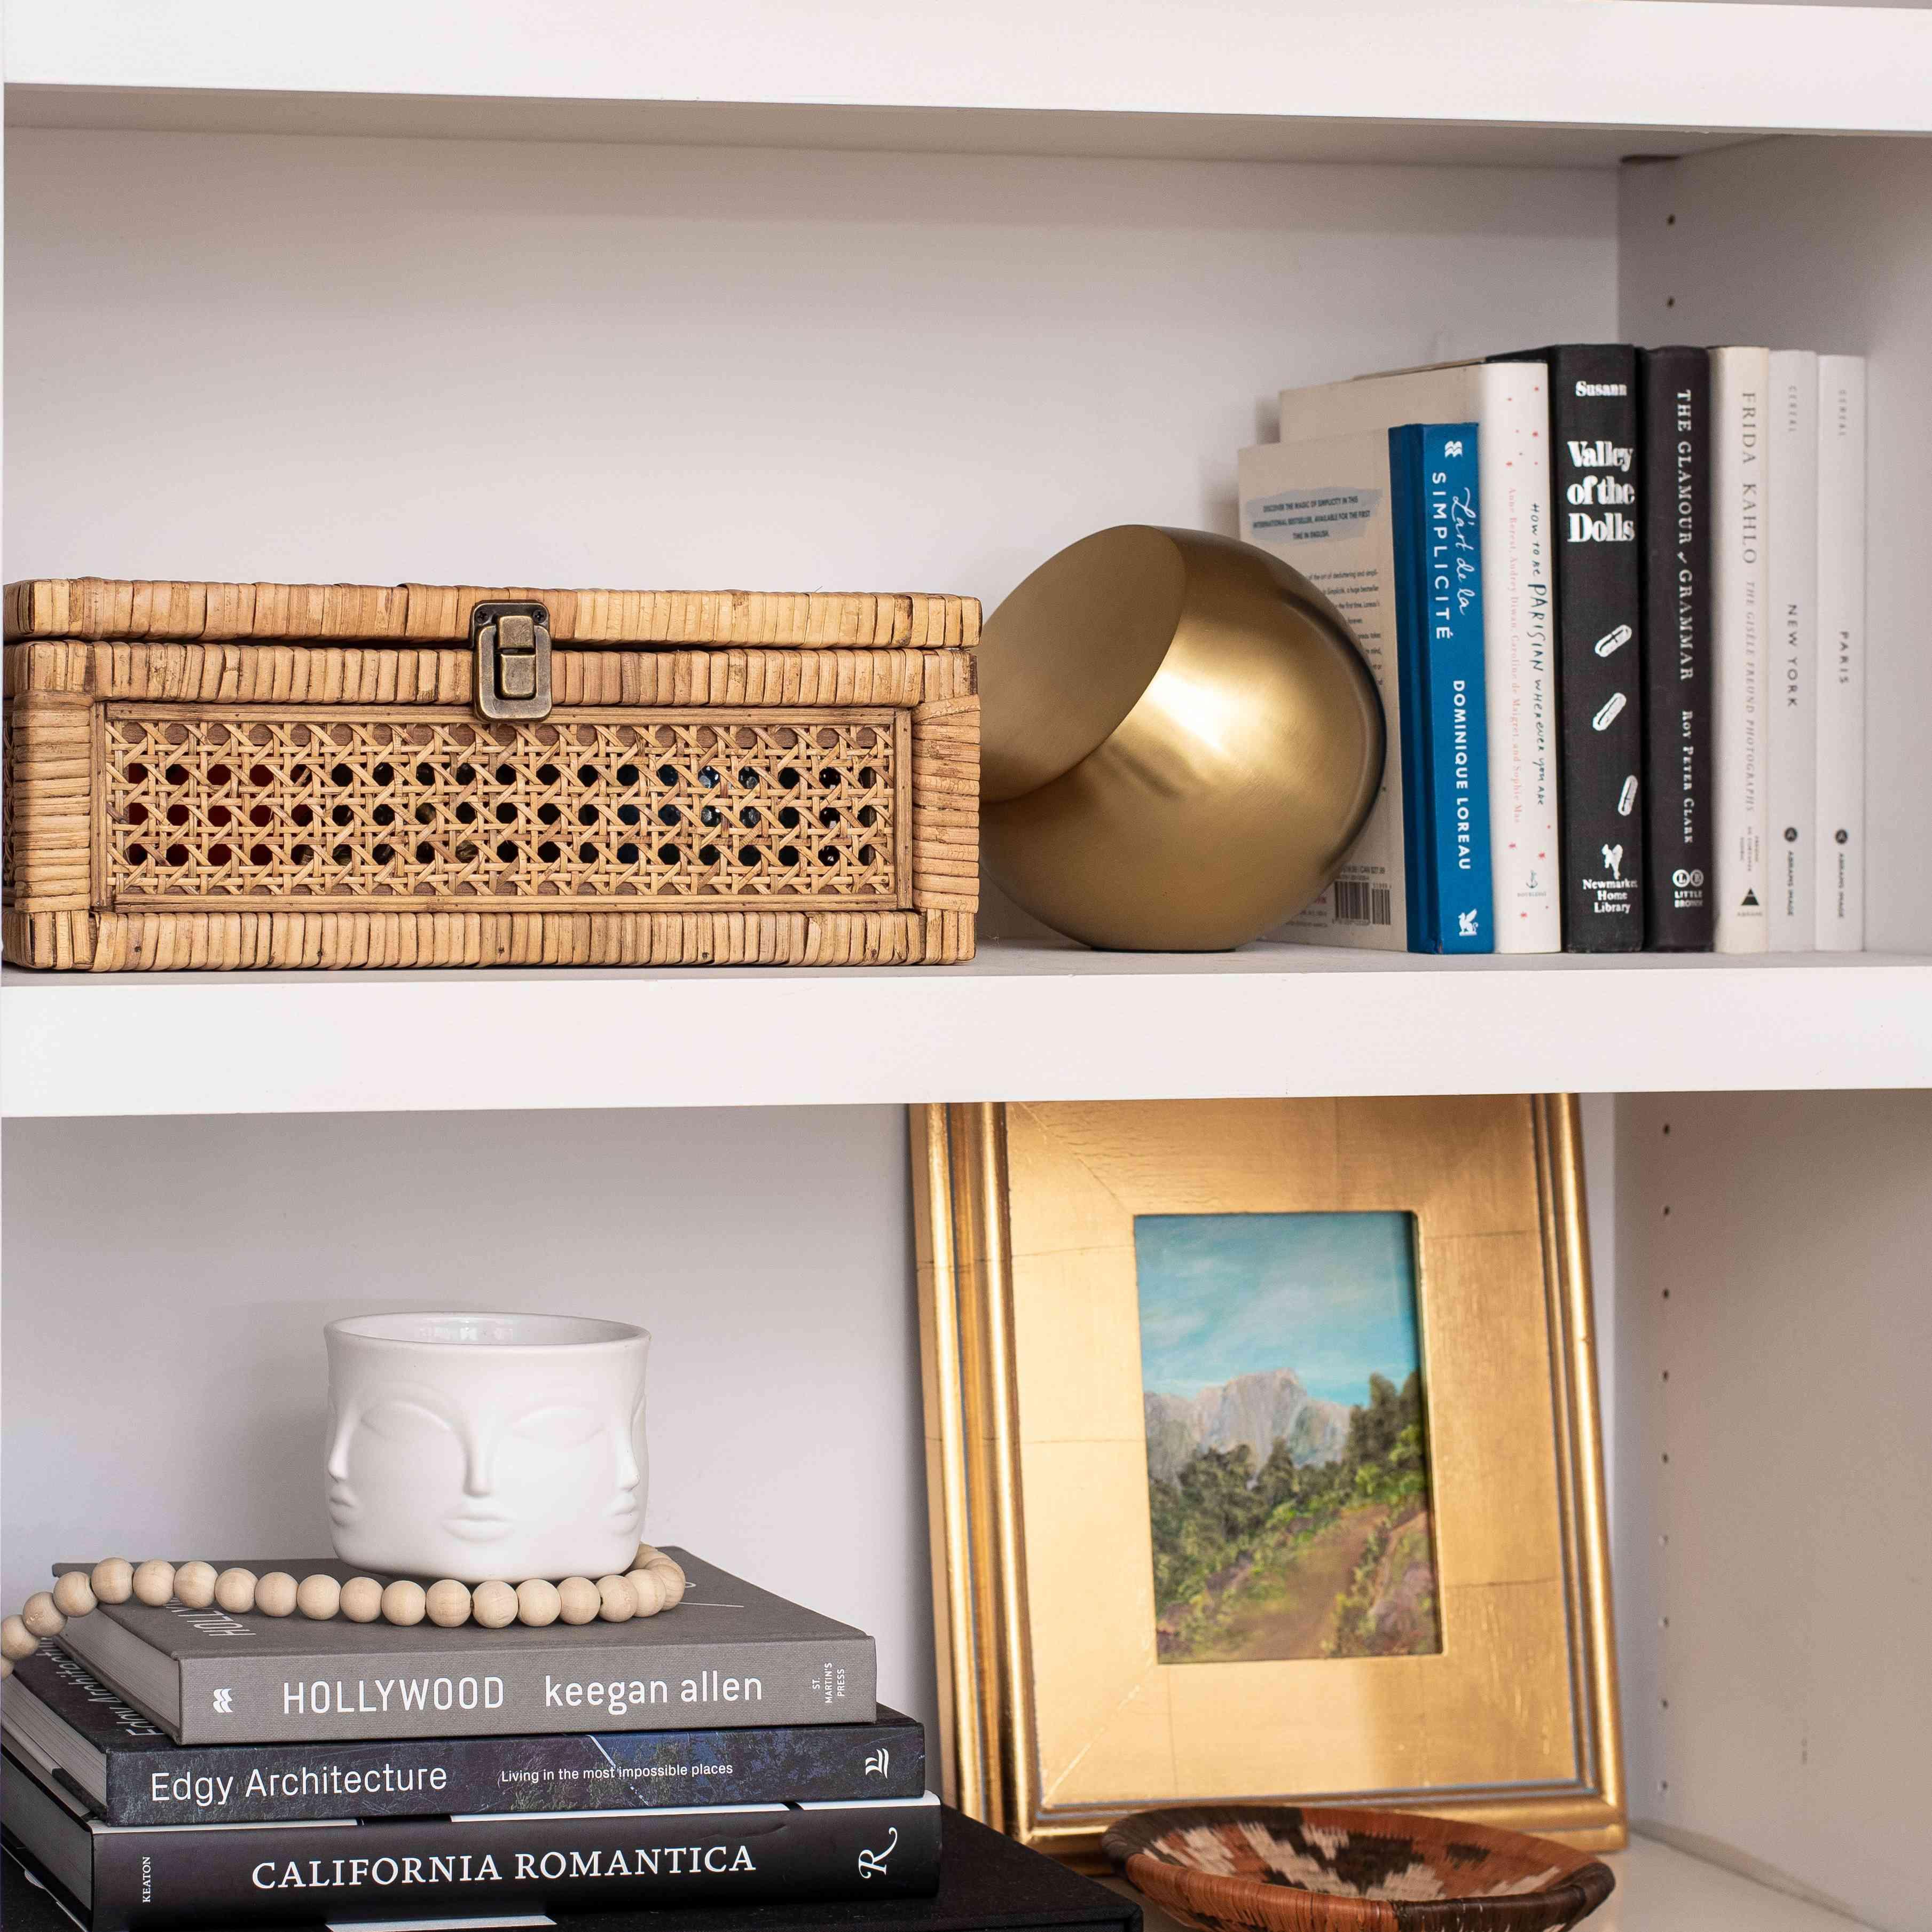 Gold decorative objects on shelf.